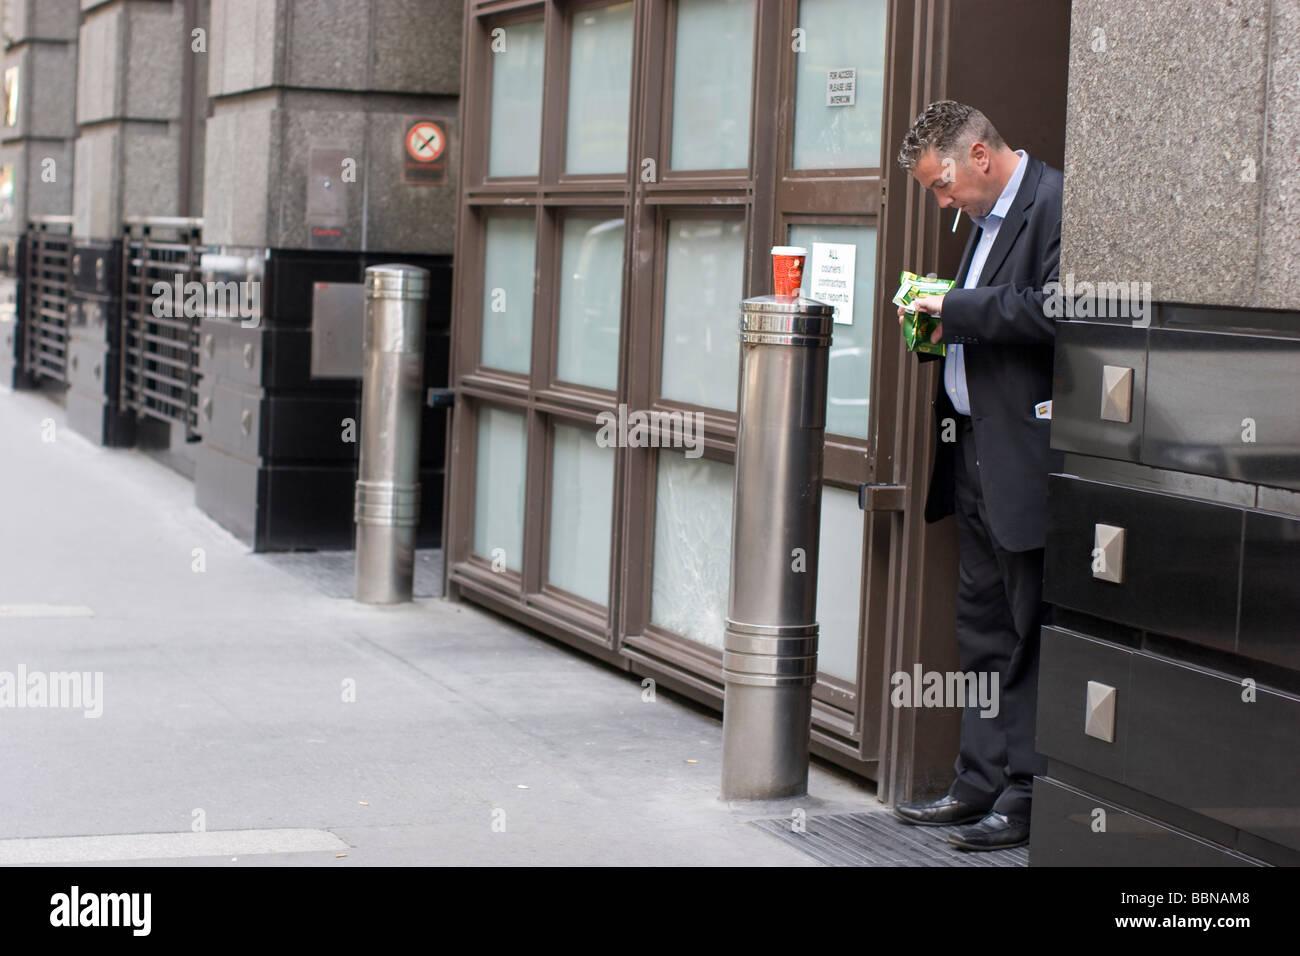 roll up, city worker Smoker in doorway London UK smoker rolling up cigarette in doorway in London street - Stock Image